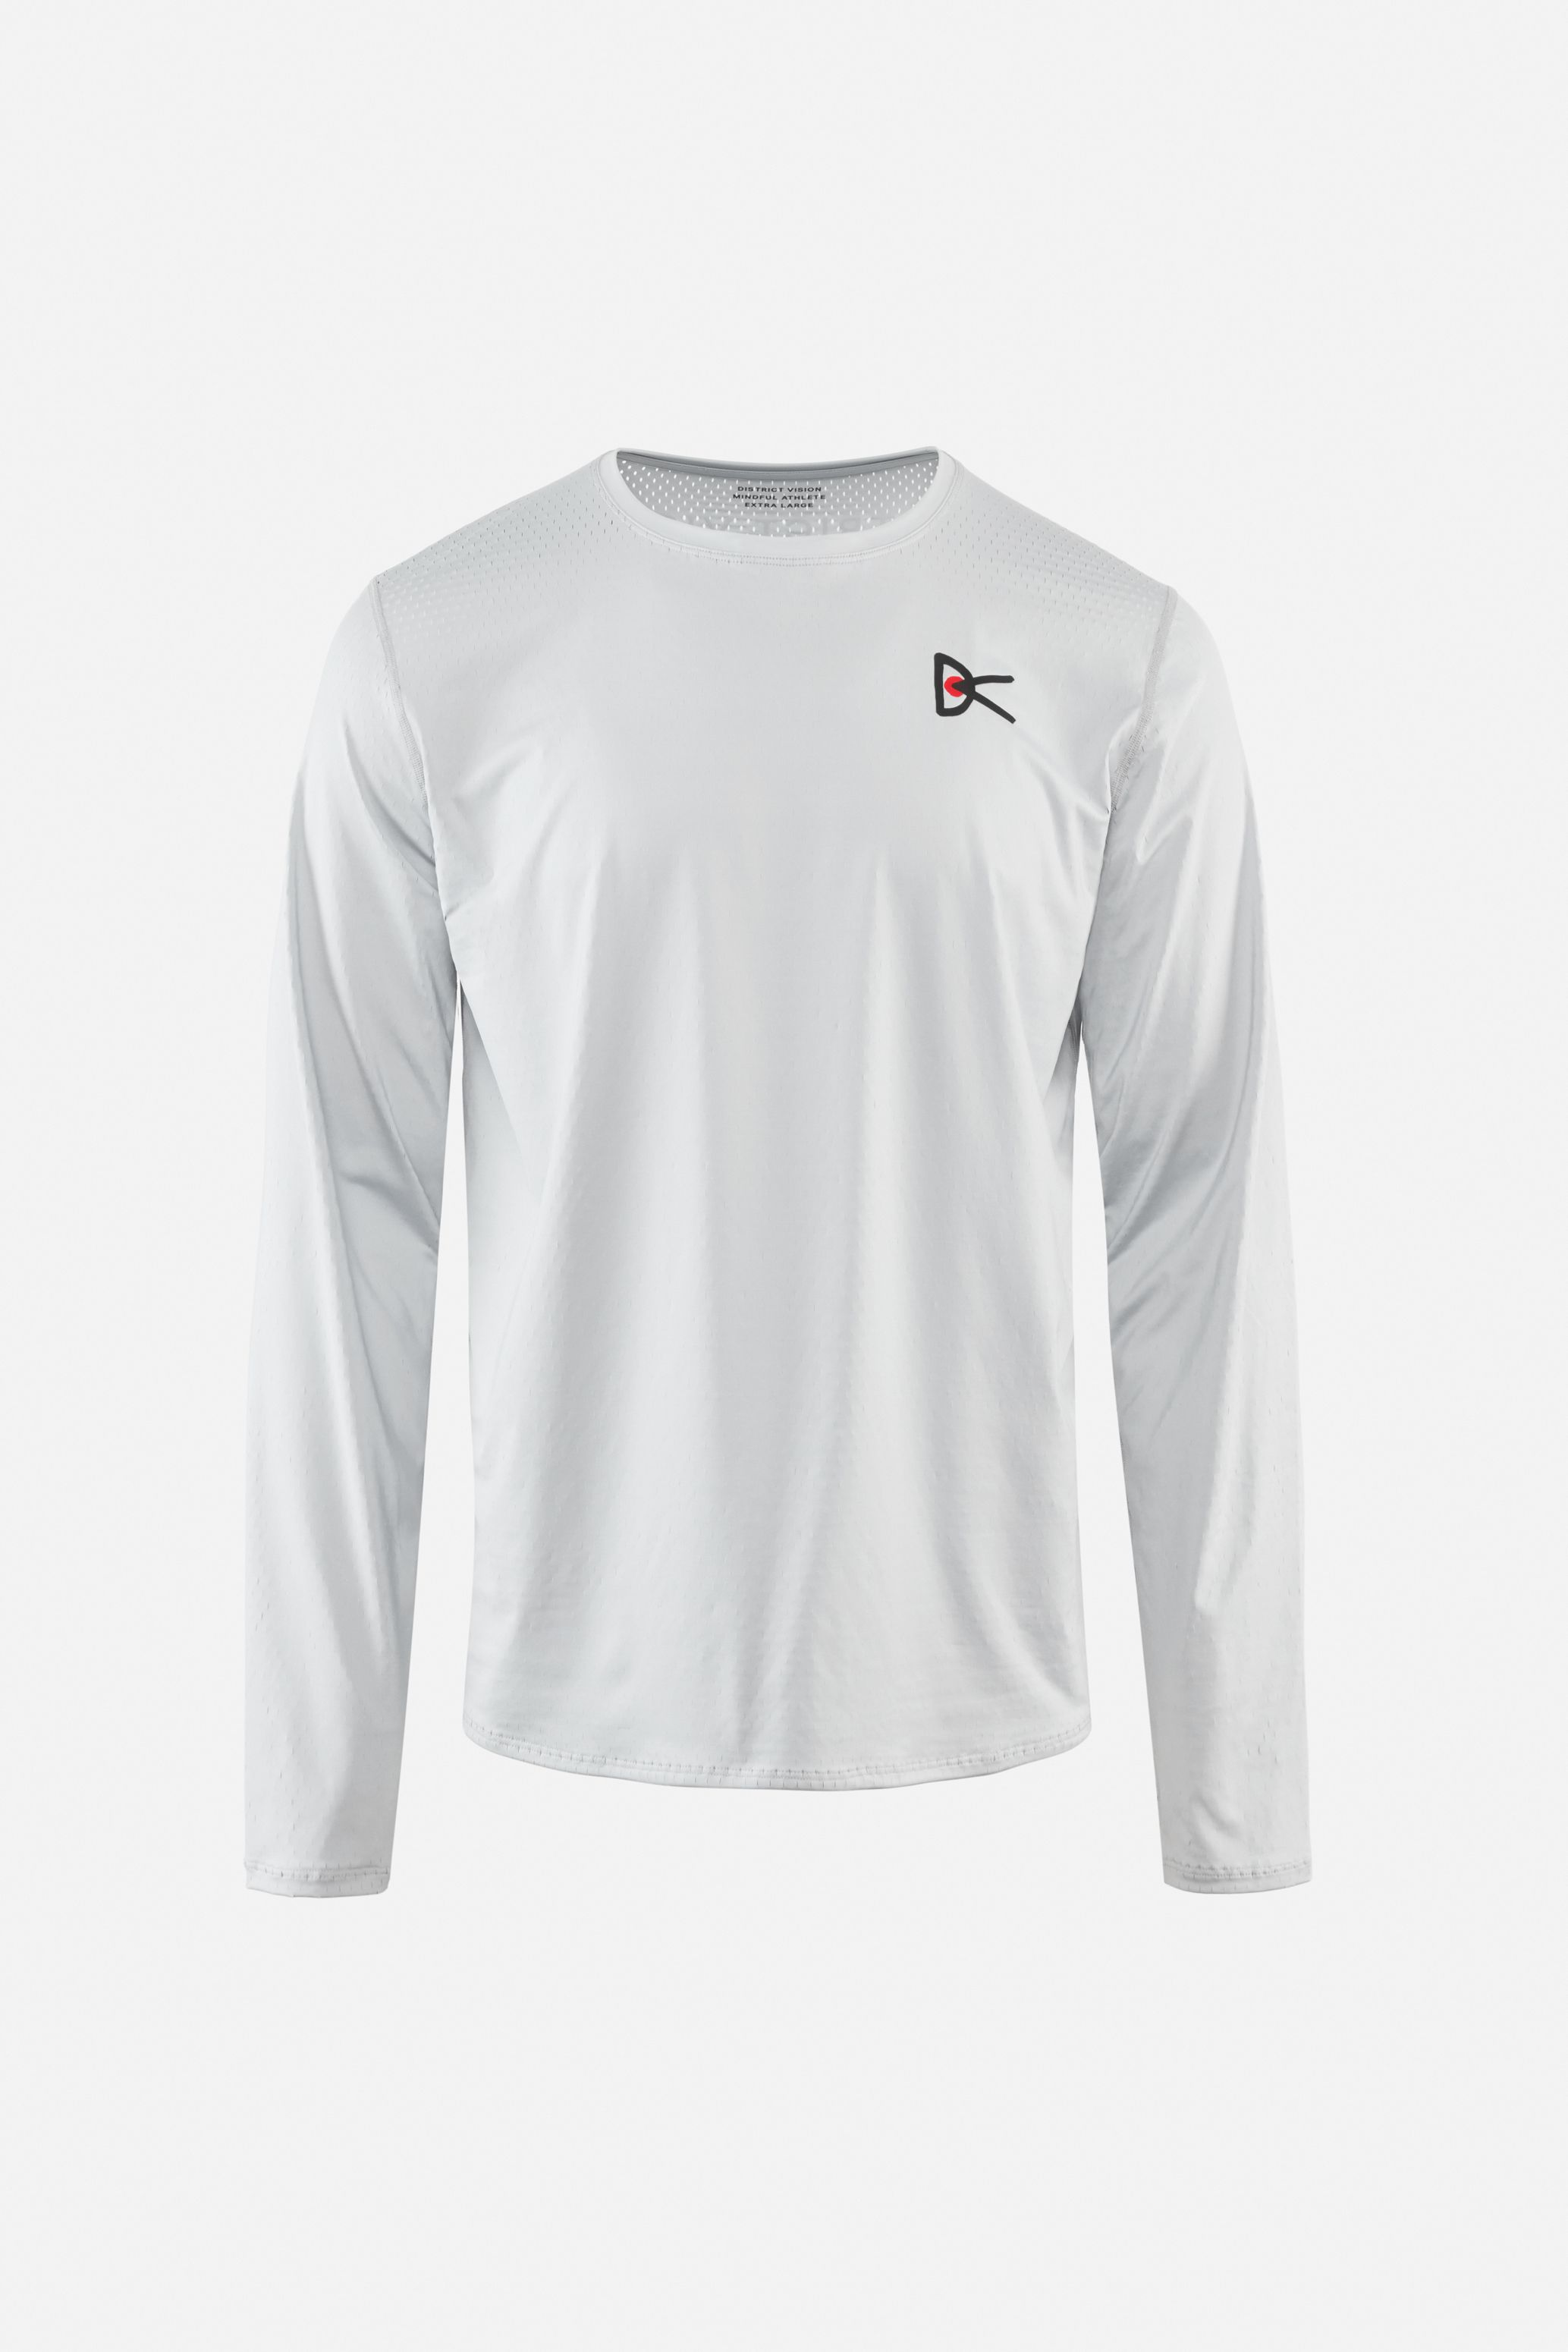 Air––Wear Long Sleeve T-shirt, Ice